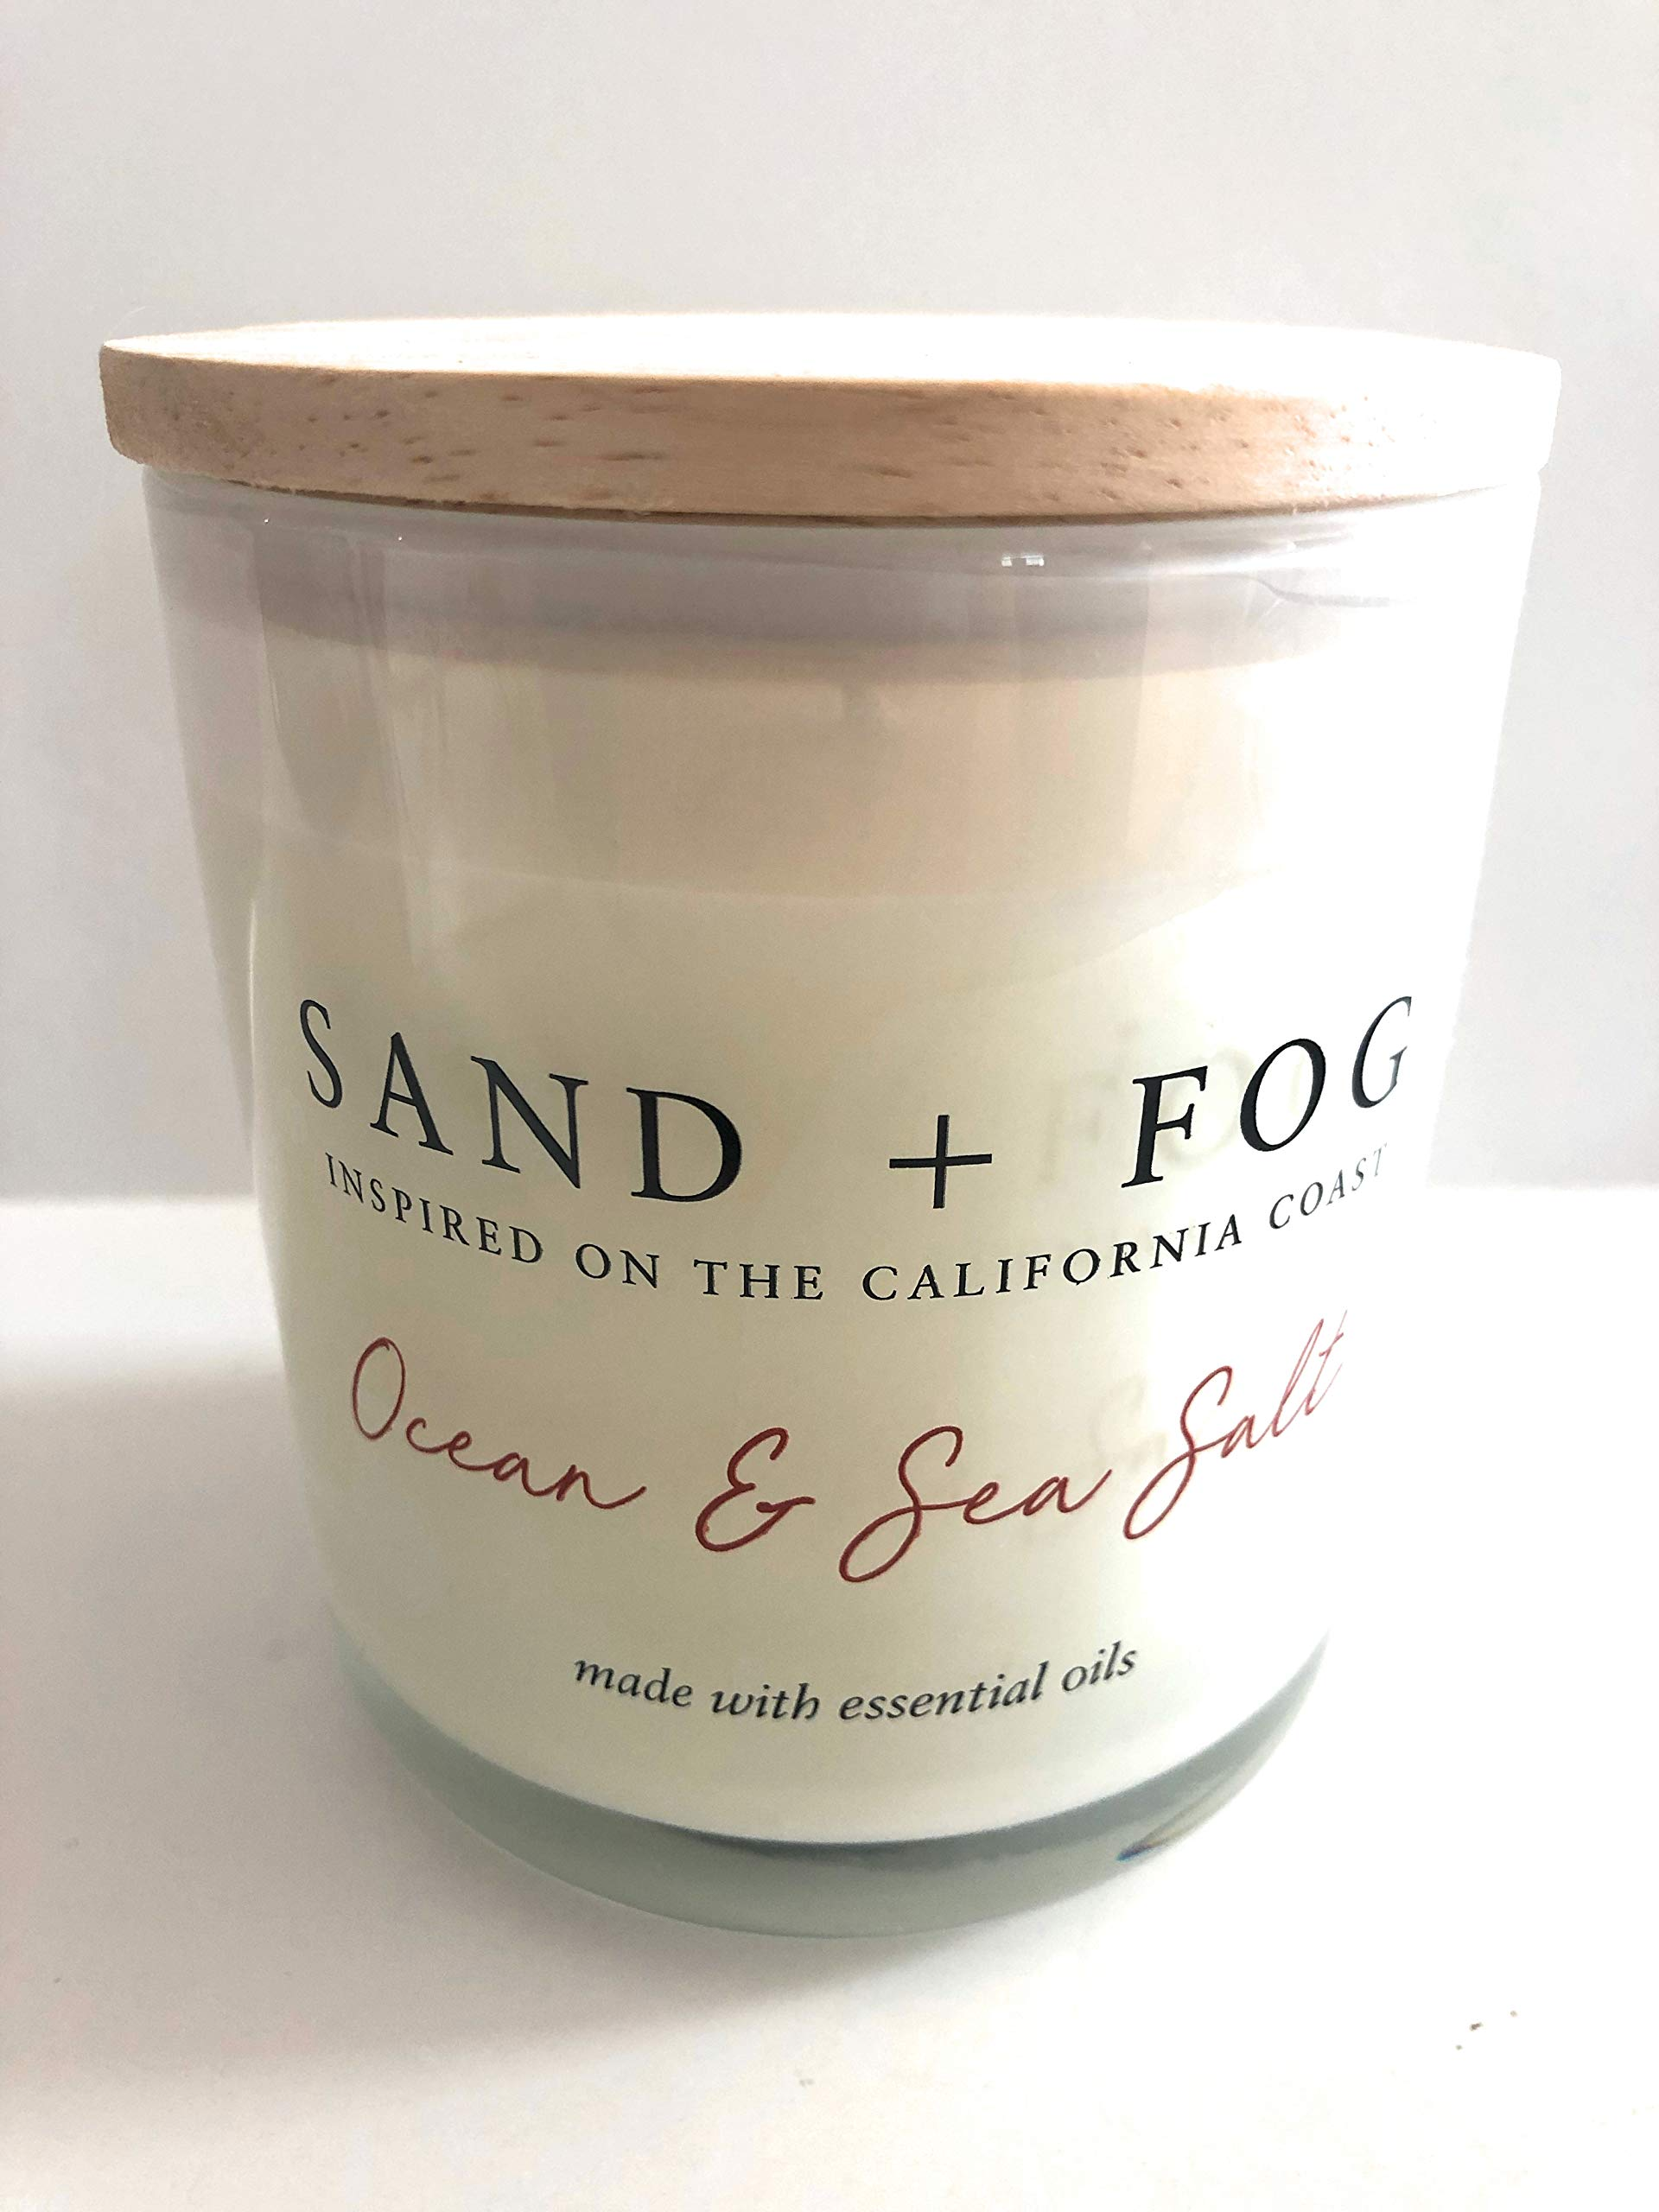 Sand + Fog Ocean Sea Salt Single Wick Candle with Lid 12 Oz